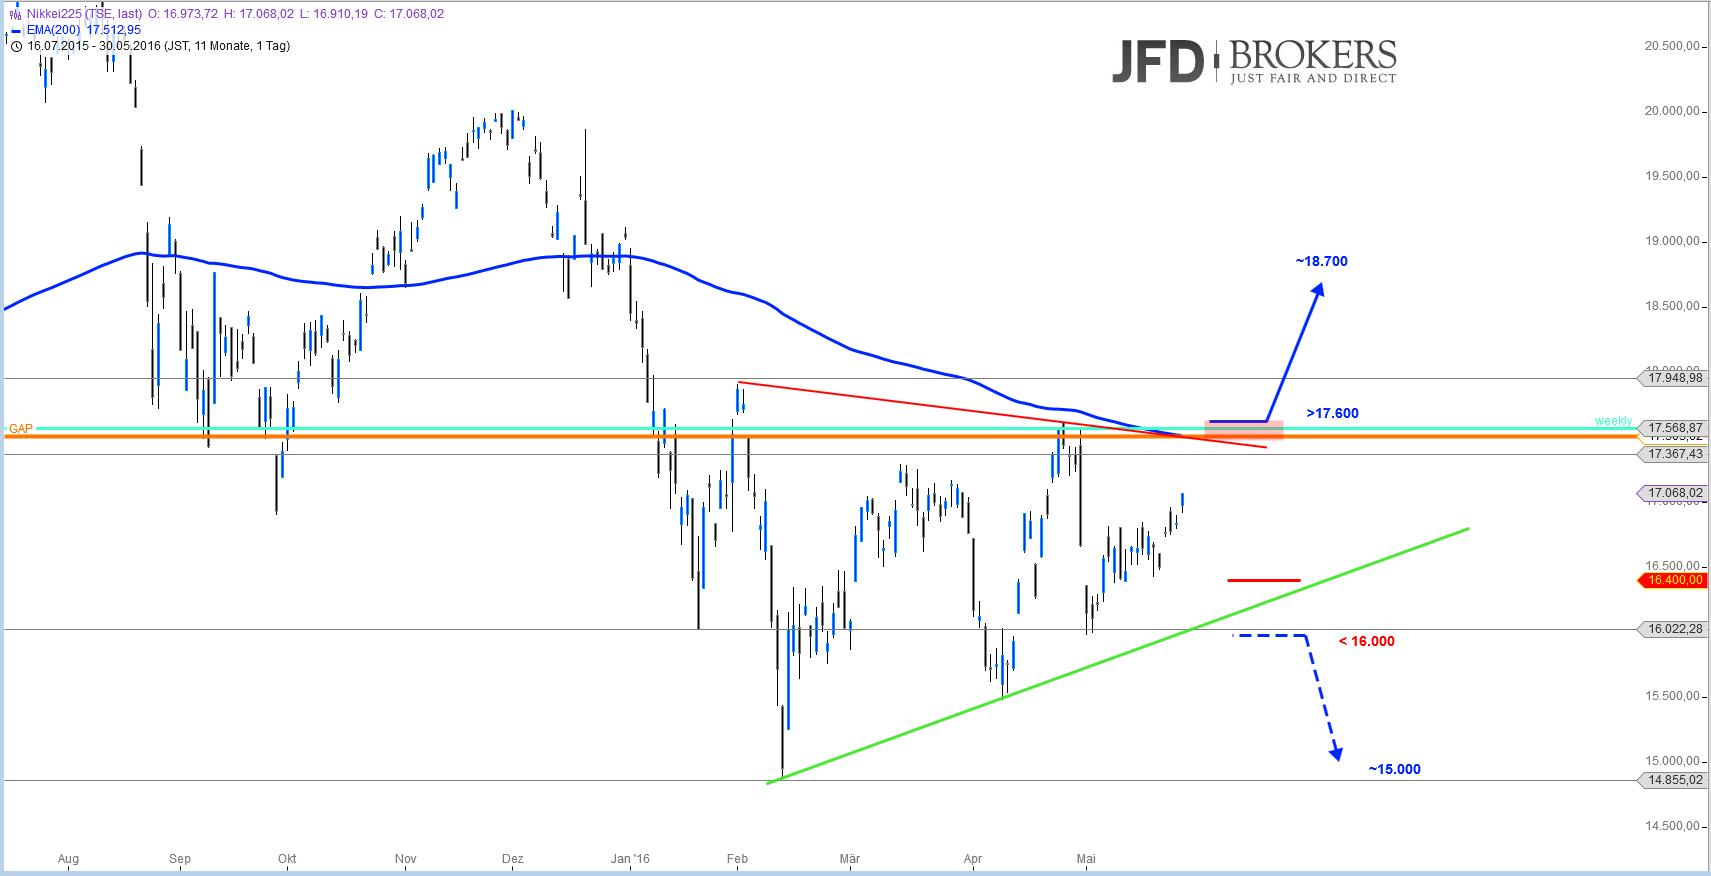 ASIEN-im-Doppelpack-Wo-würden-neue-Signale-entstehen-Kommentar-JFD-Brokers-GodmodeTrader.de-2